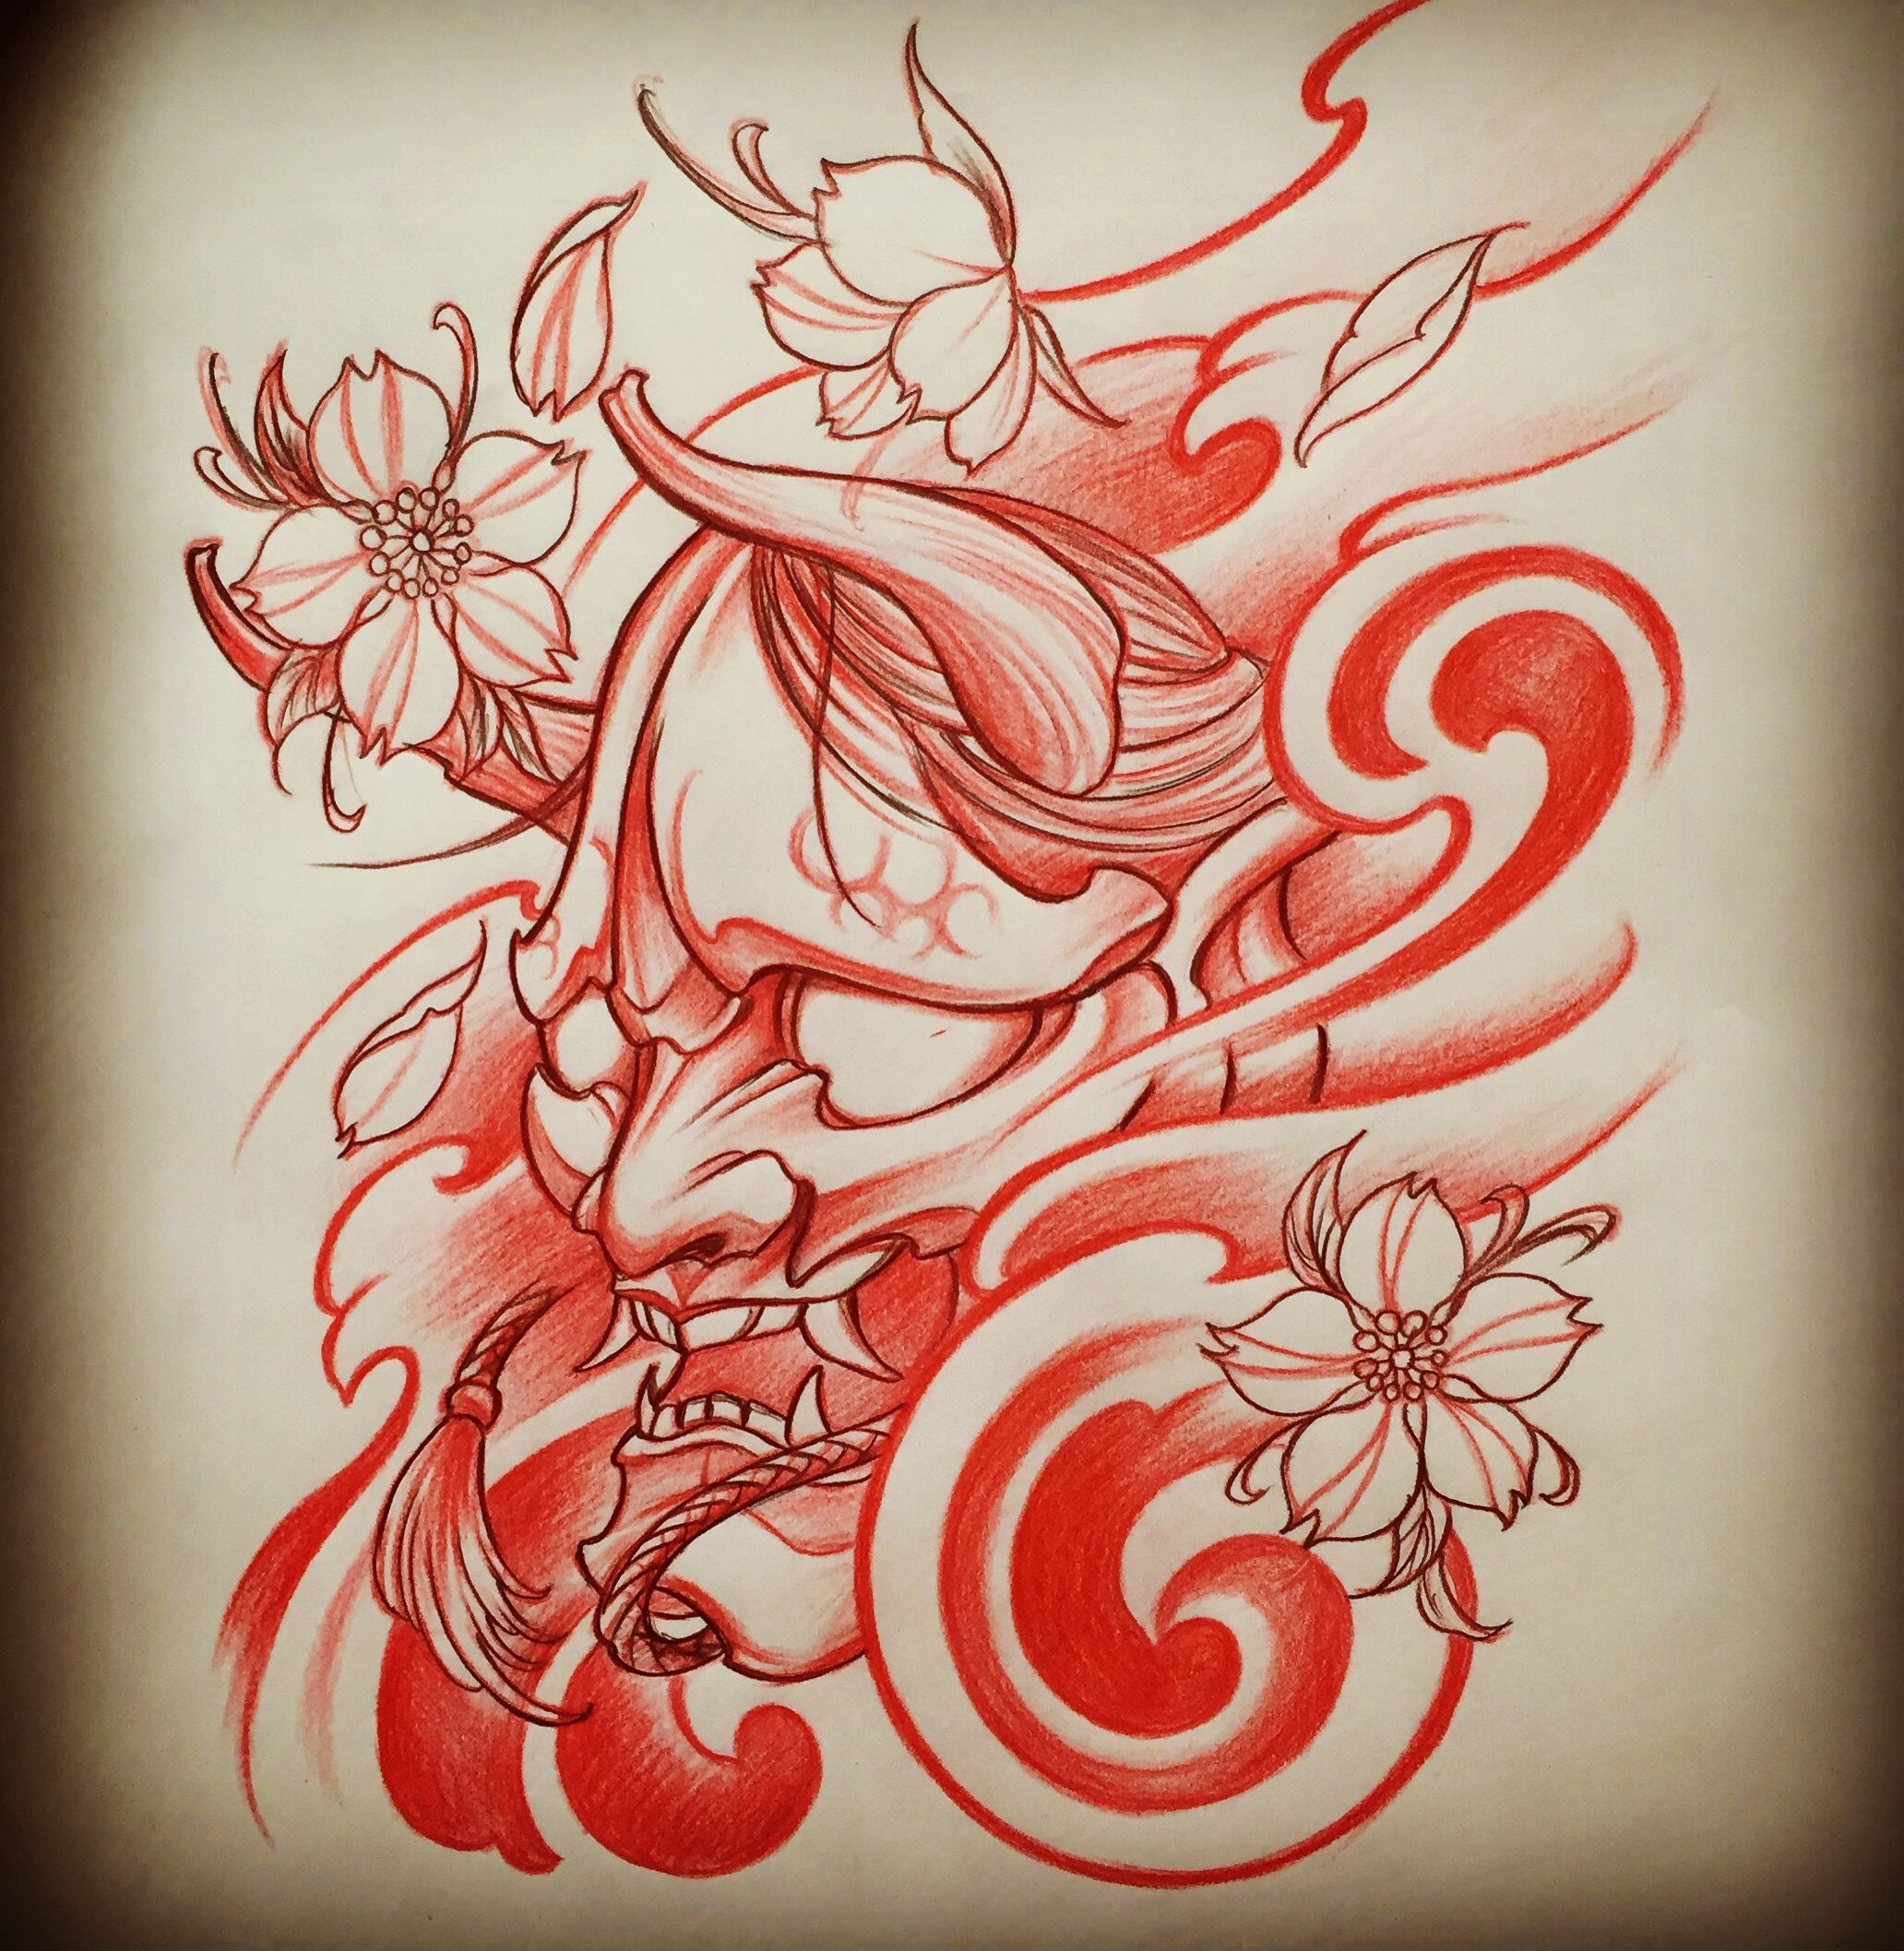 Tattoo Designs Japanese: Amsterdam TATTOO 1825 KIMIHITO Hannya Mask Japanese Style